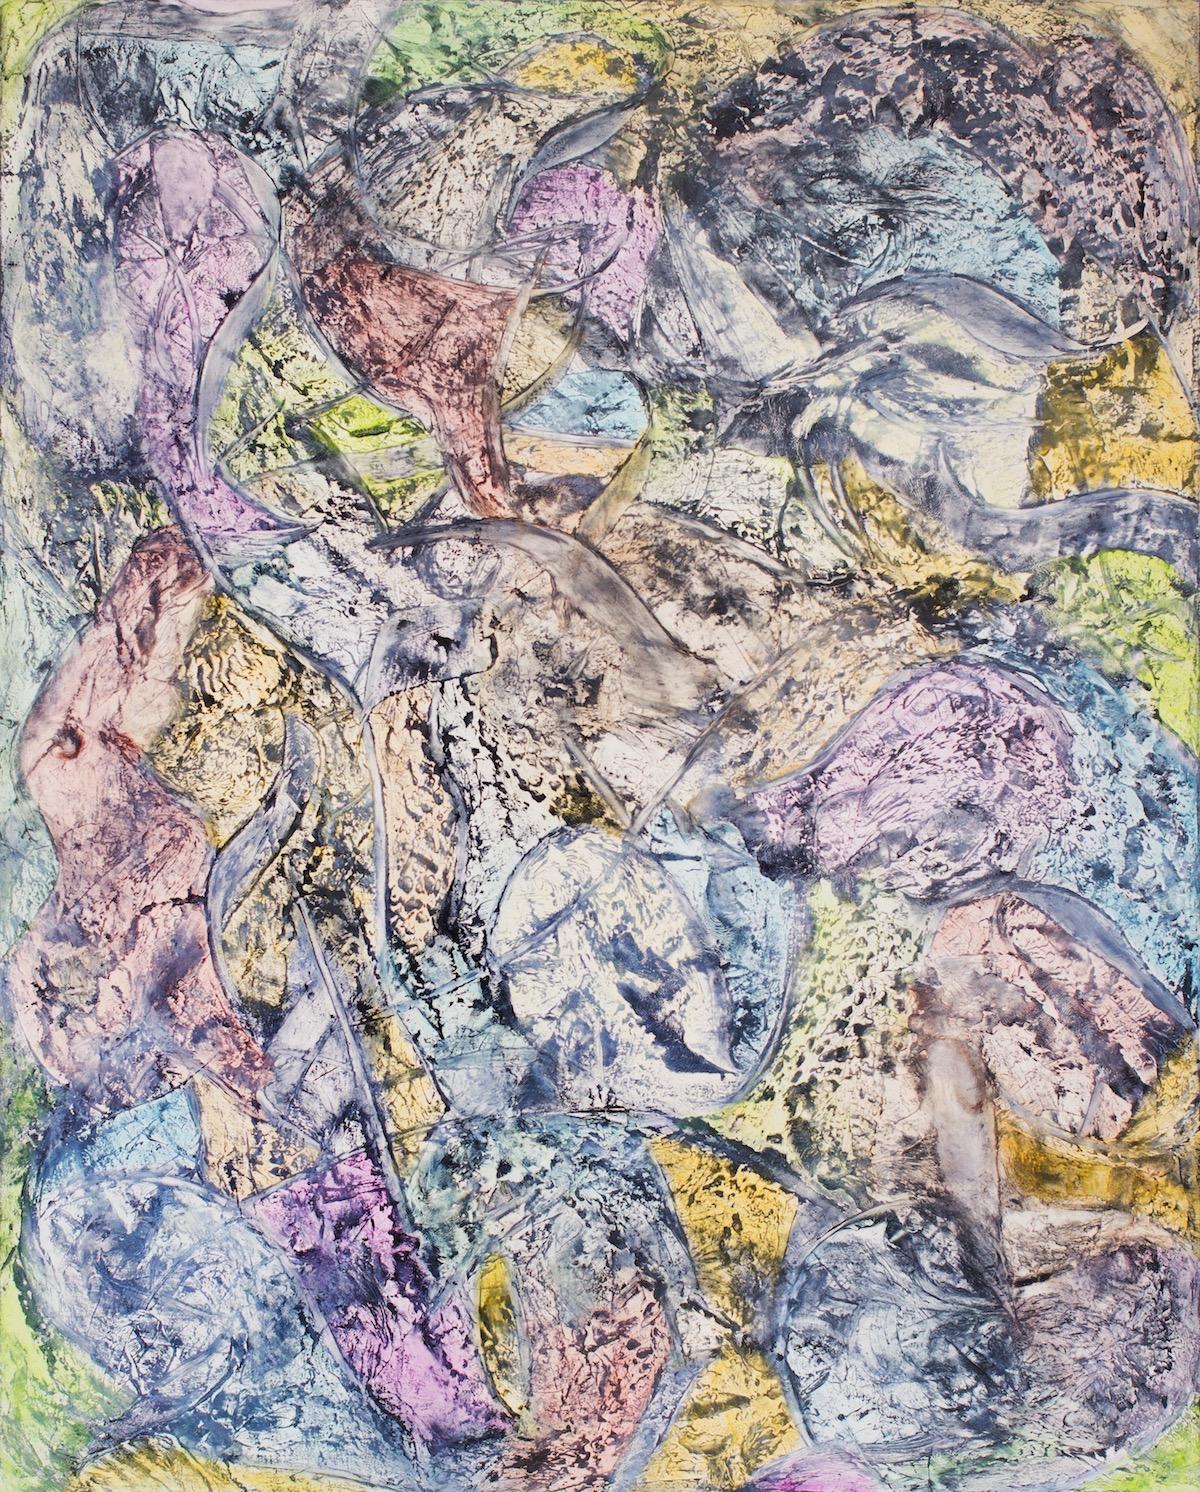 Jill Krutick,  Elektra, 2015,  Oil on canvas, 60 x 48 inches (152.4 x 121.9 cm). Framed: 62 x 50 inches (157.5 x 127.0 cm).